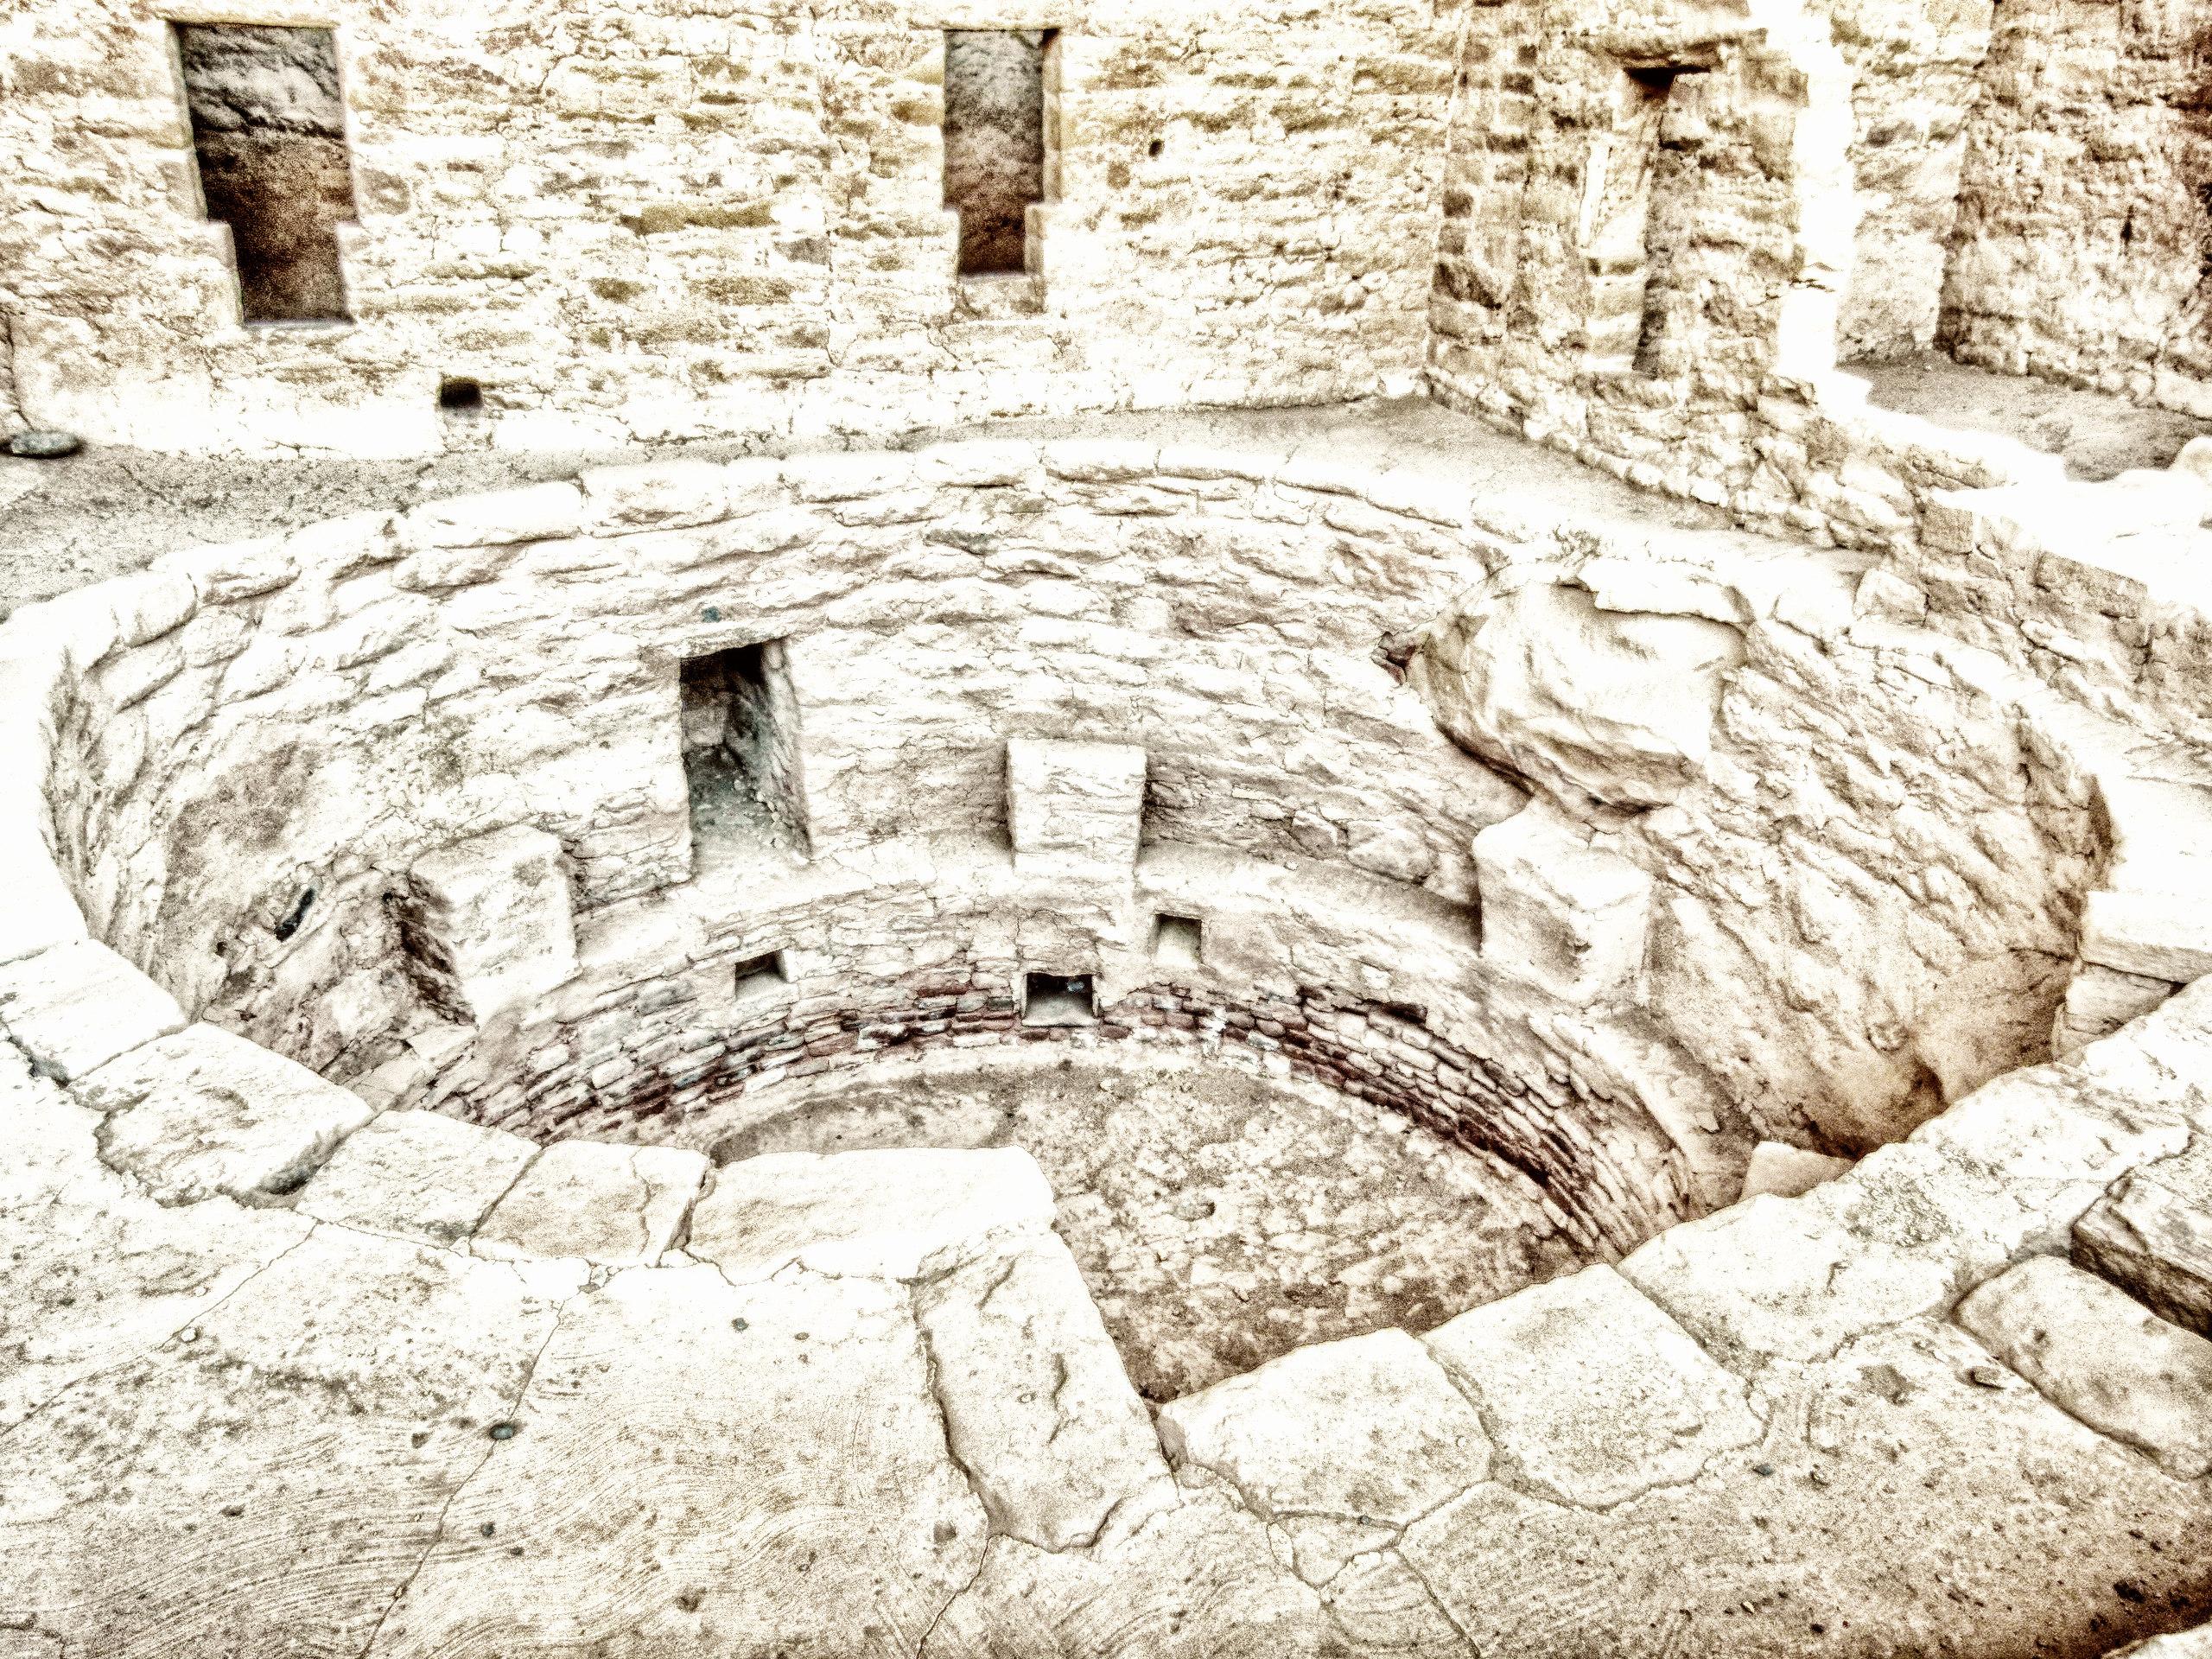 USA Südwest - Anasazi Kultur - Tipps